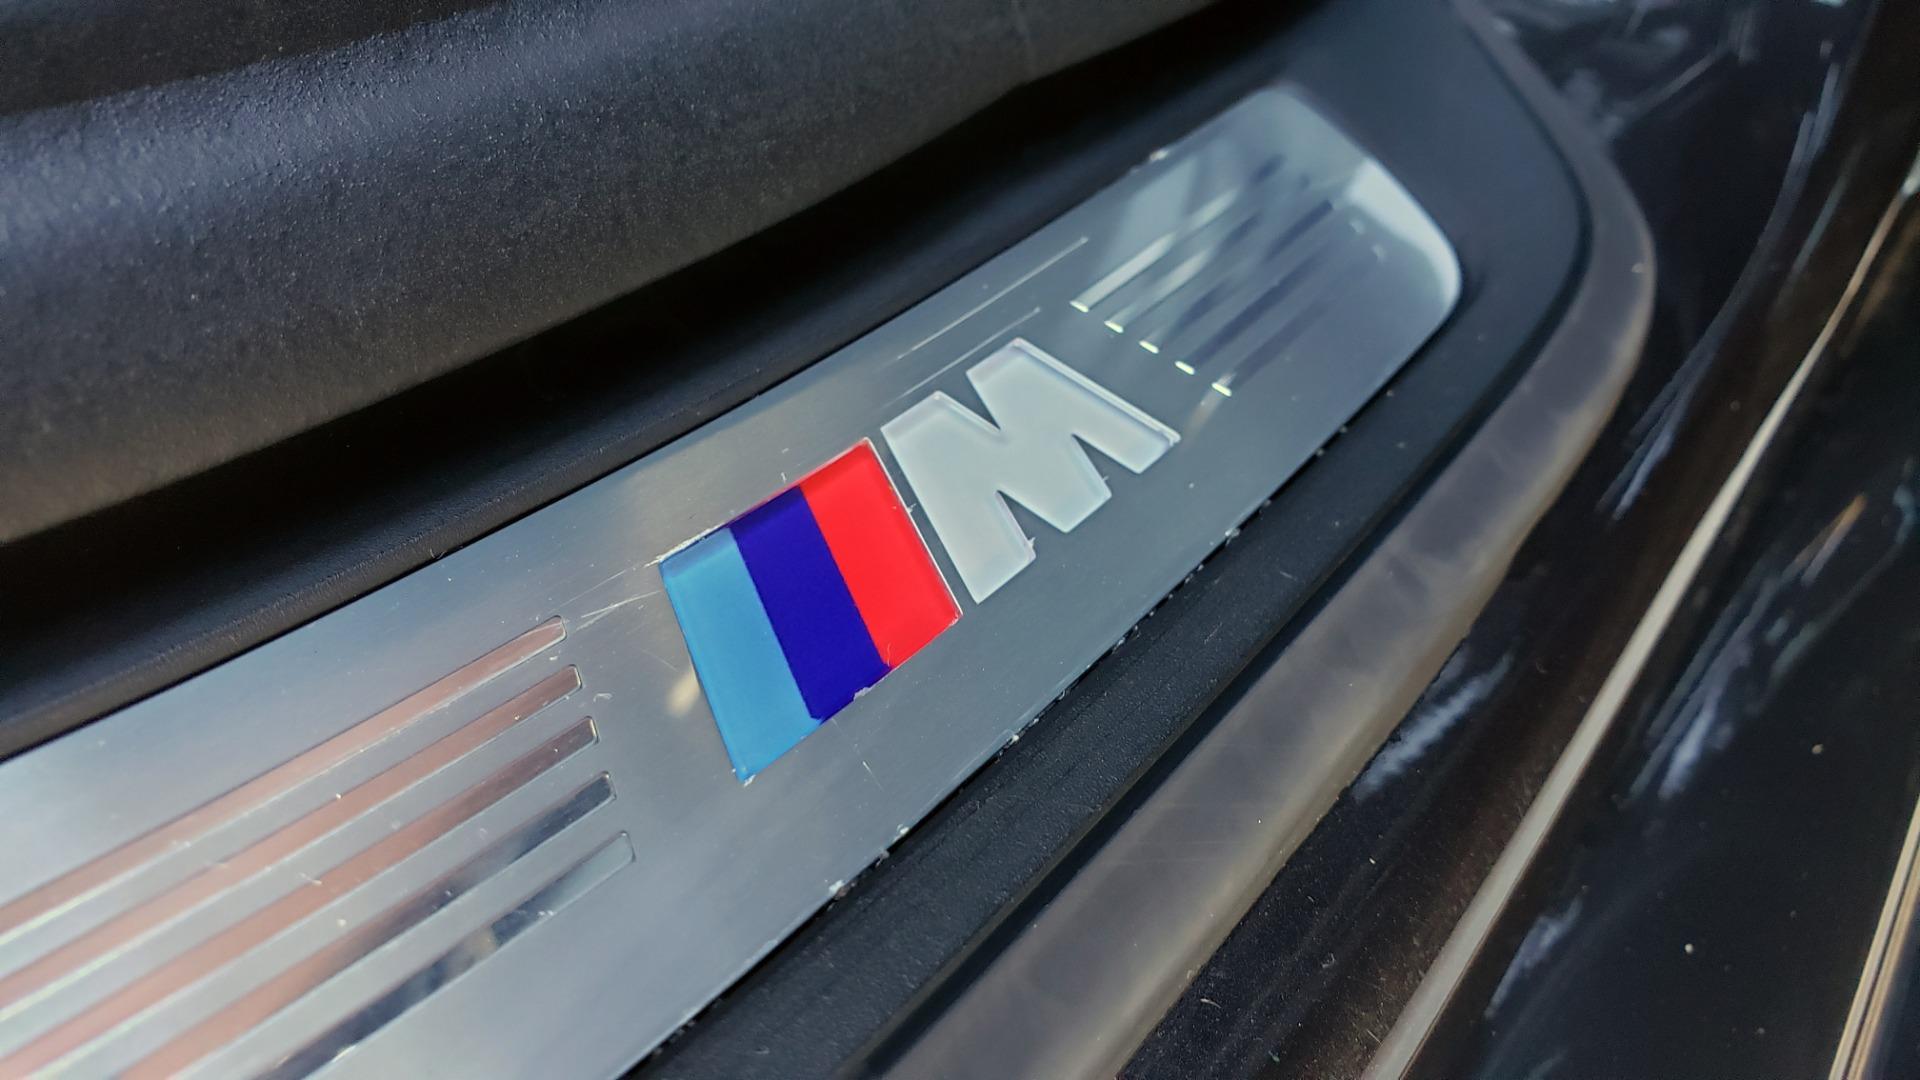 Used 2018 BMW 5 SERIES 540I M-SPORT / DRVR ASST / EXEC PKG / NAV / SUNROOF / HUD / REARVIEW for sale Sold at Formula Imports in Charlotte NC 28227 72